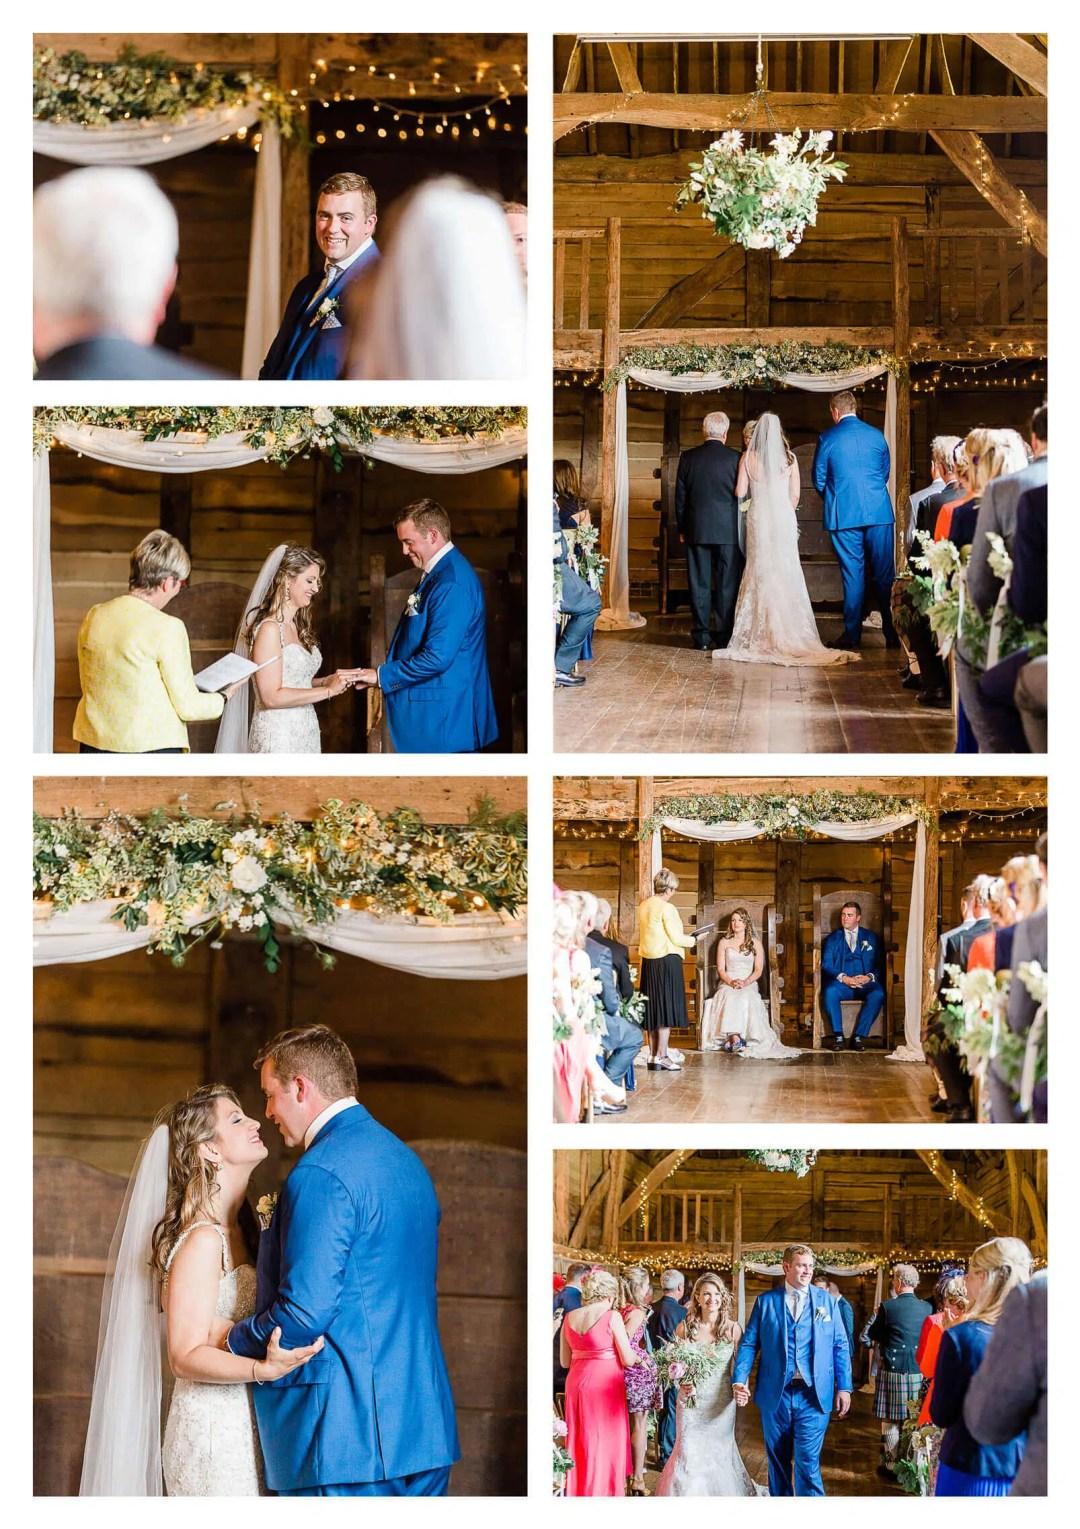 Michelham Priory barn wedding ceremony in Hailsham   East Sussex Photographer